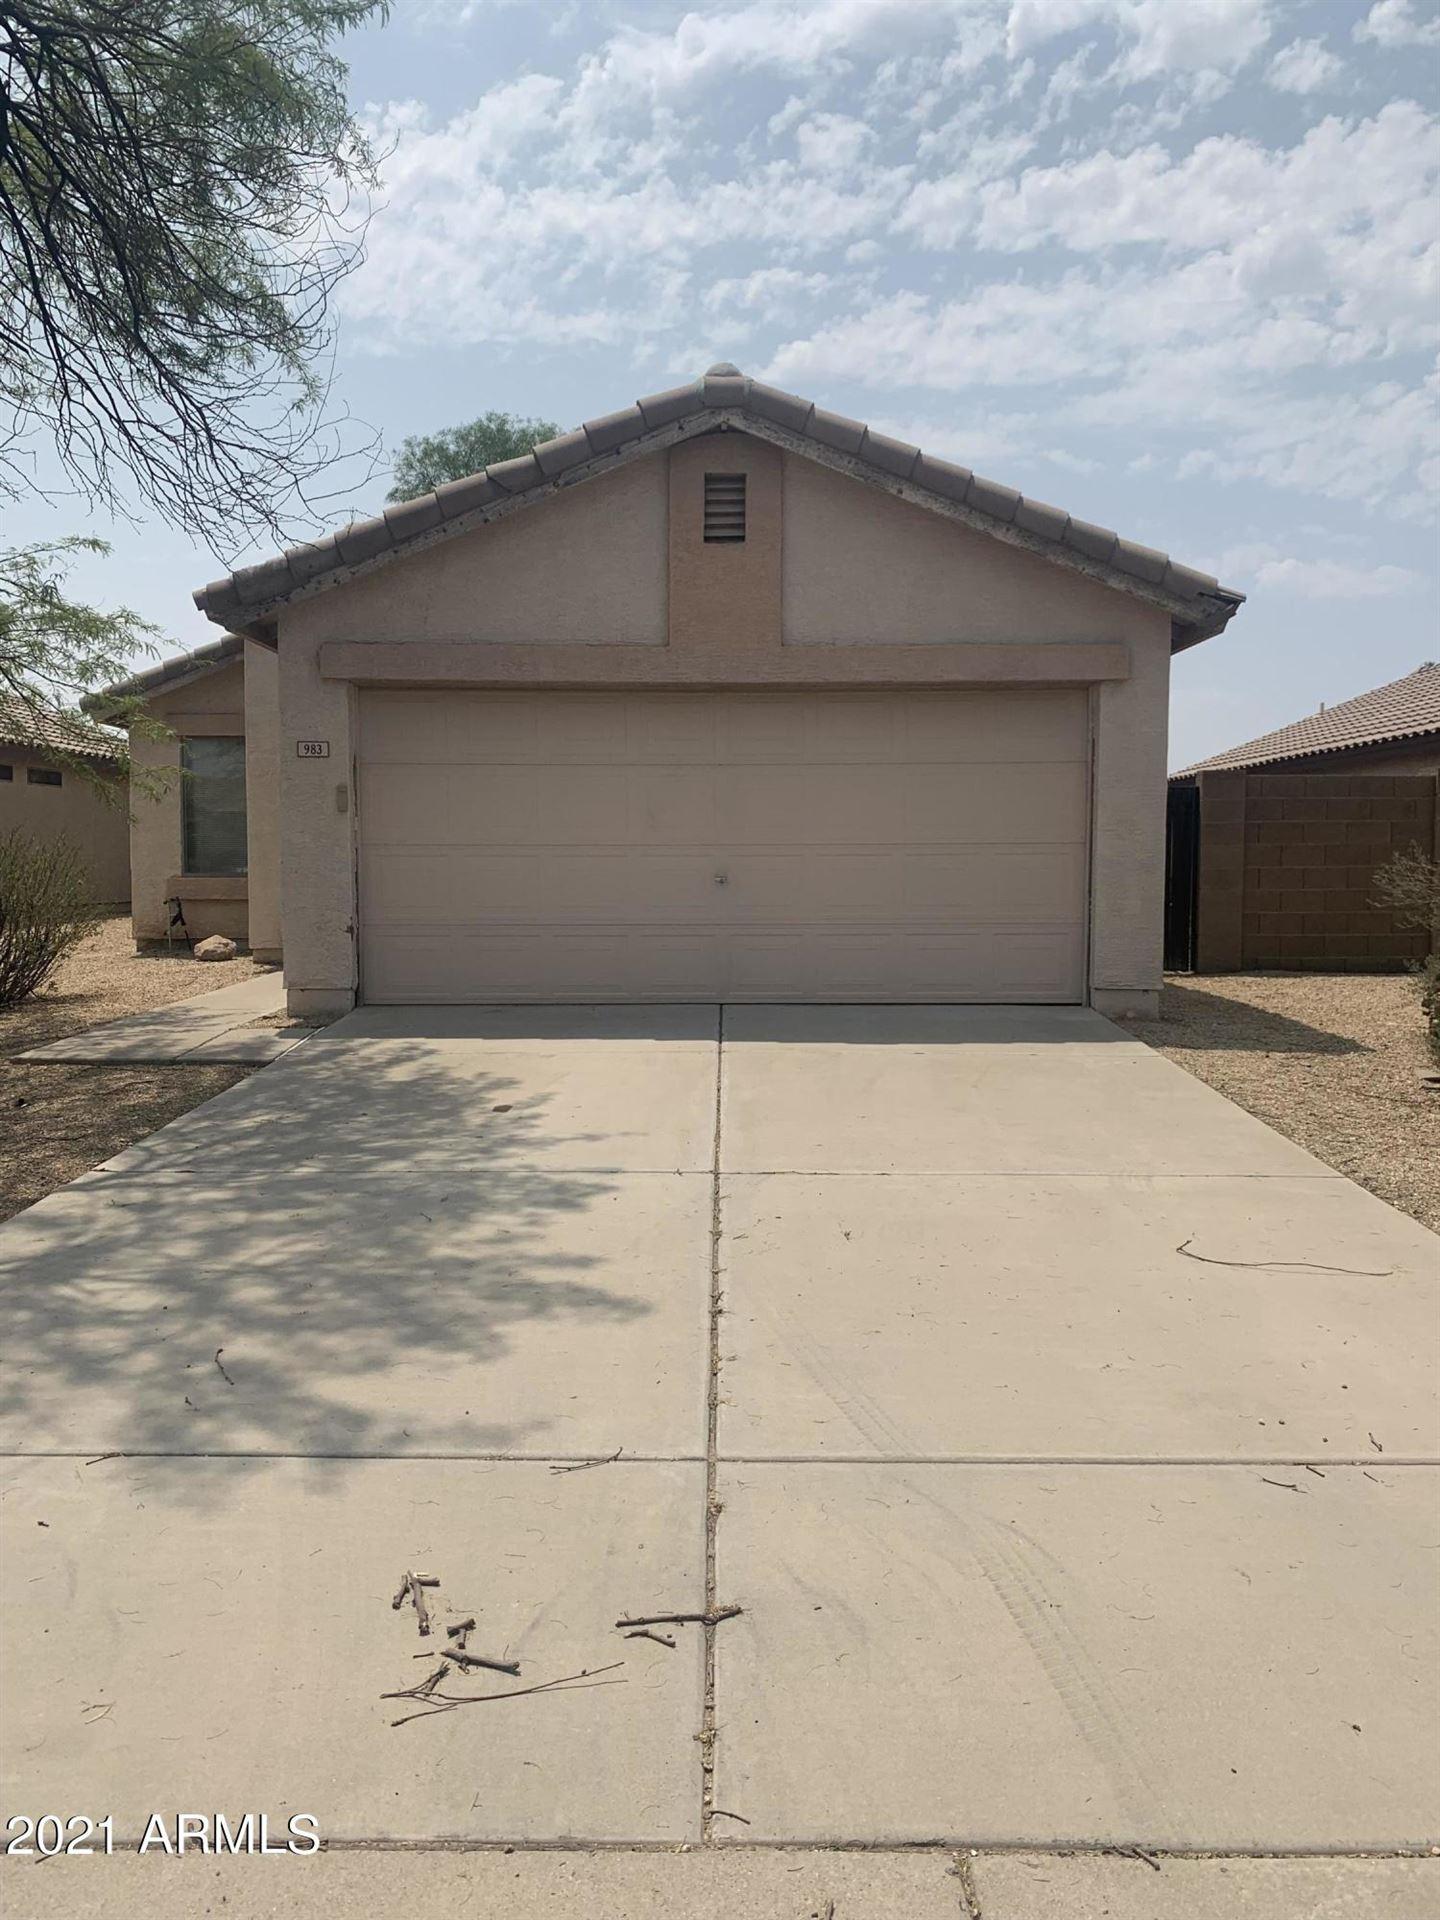 Photo of 983 E GREENLEE Avenue, Apache Junction, AZ 85119 (MLS # 6268521)